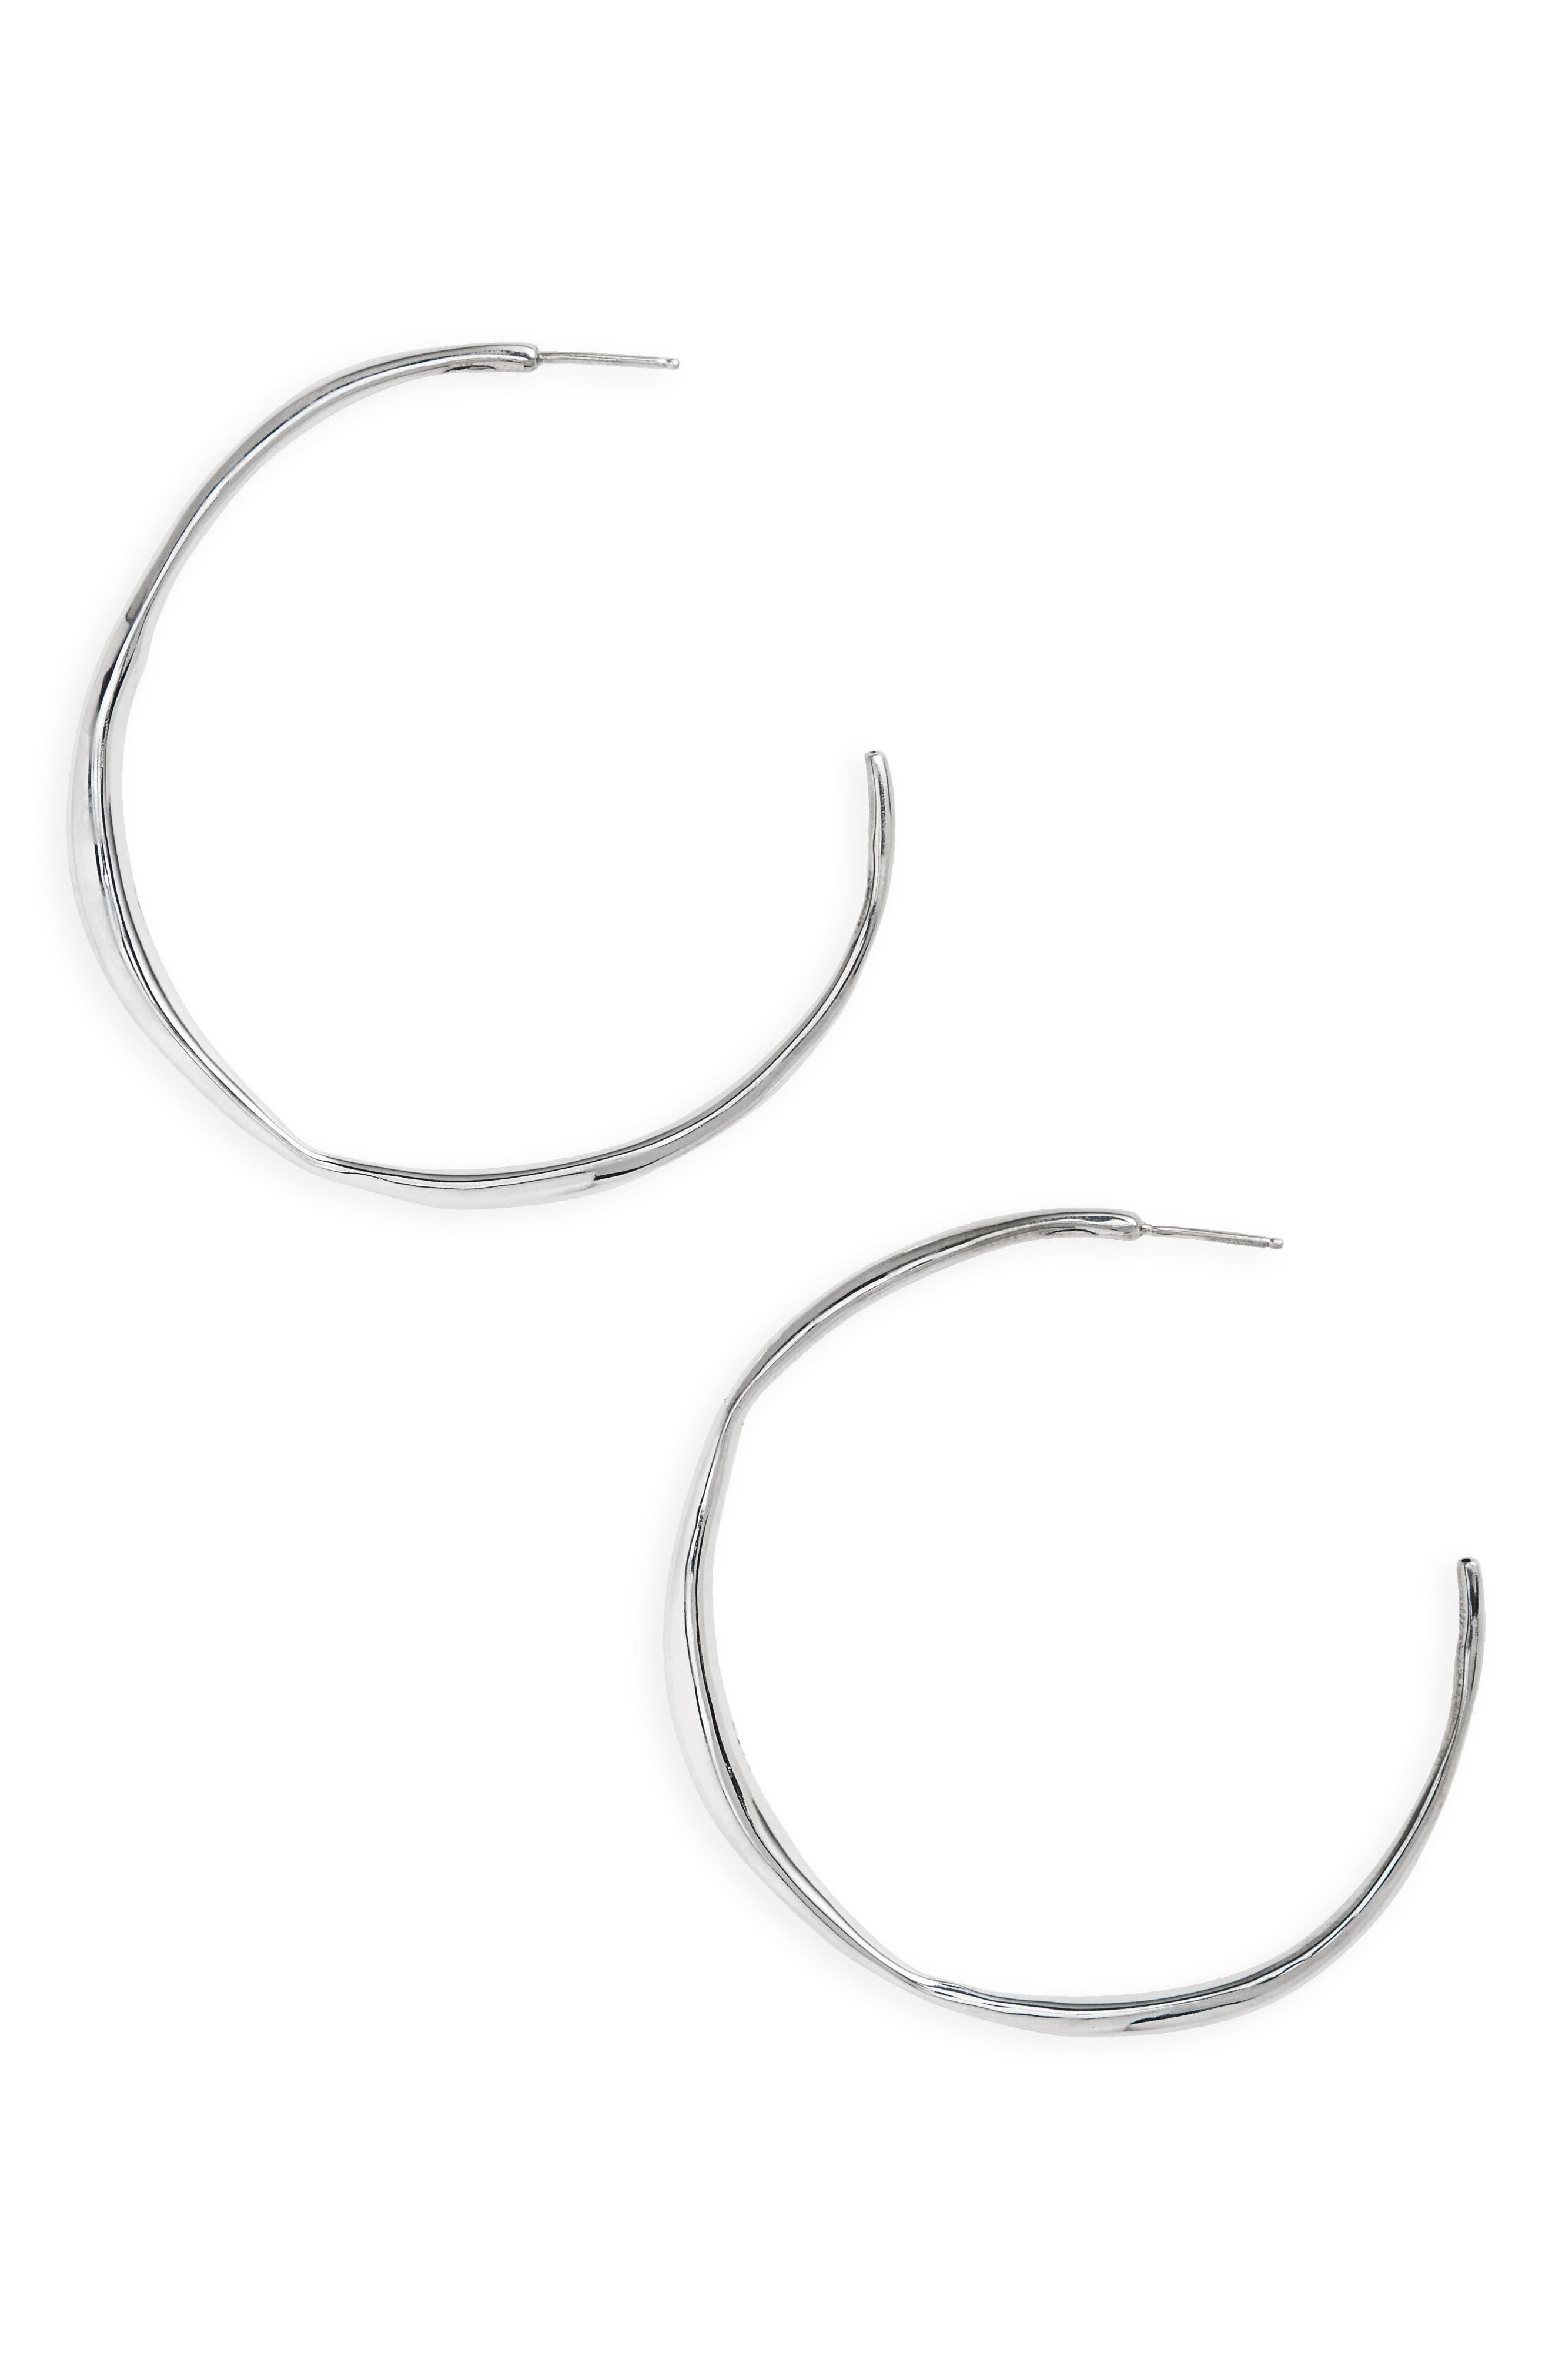 Medium Vero Hoops,                         Main,                         color, Sterling Silver